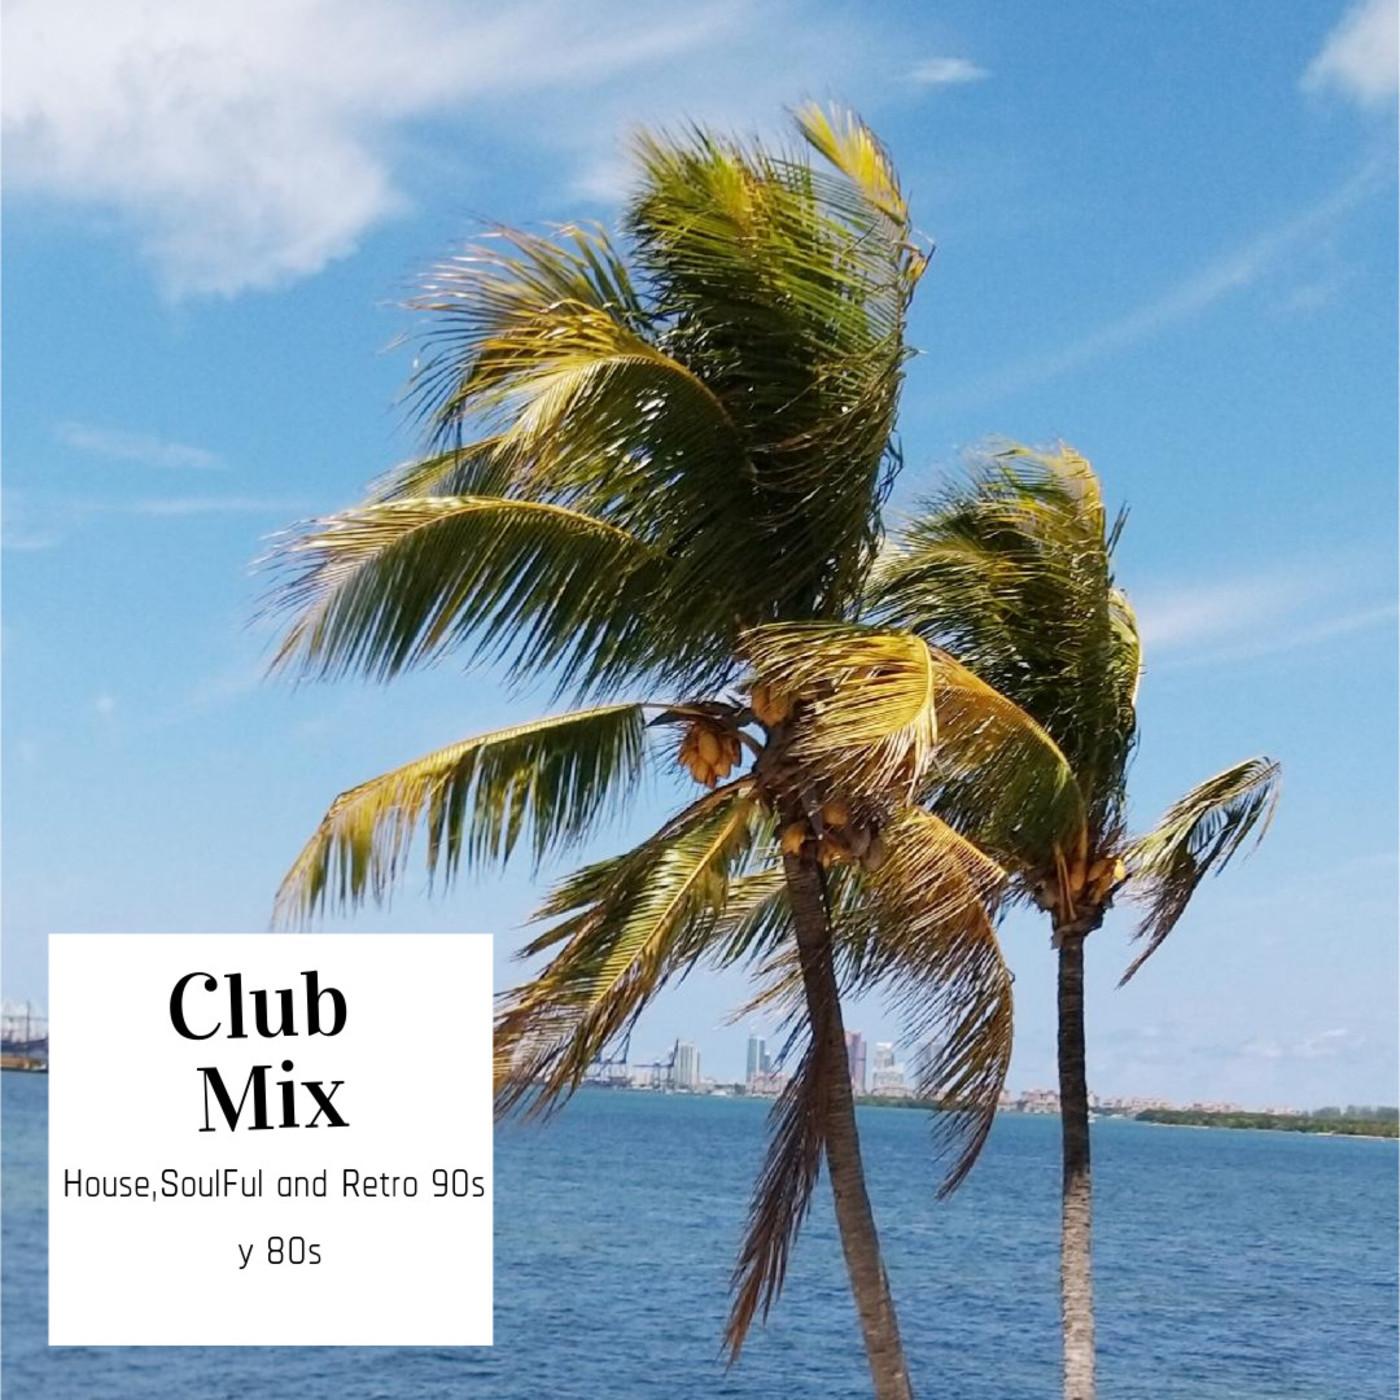 House Music Podcast,Dj Set,Dance Pop 80s,Dance 90s,Música